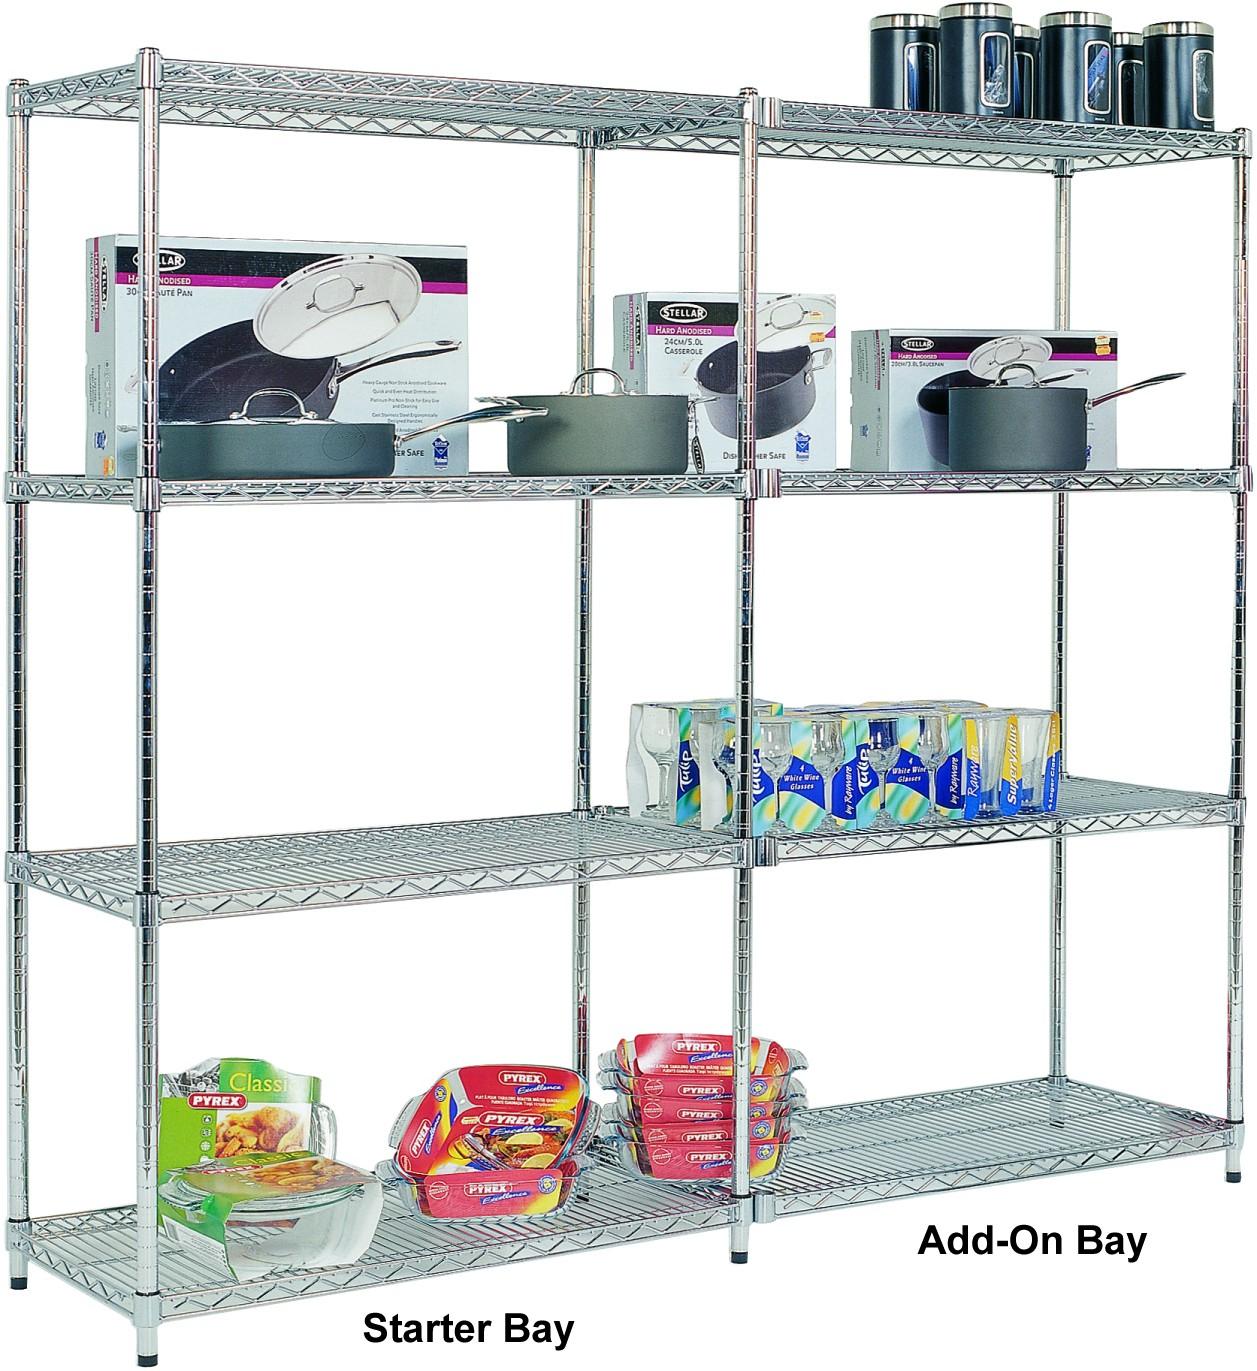 Add On Bay – 4 Chrome Shelves 1880h x 1220w x 610d